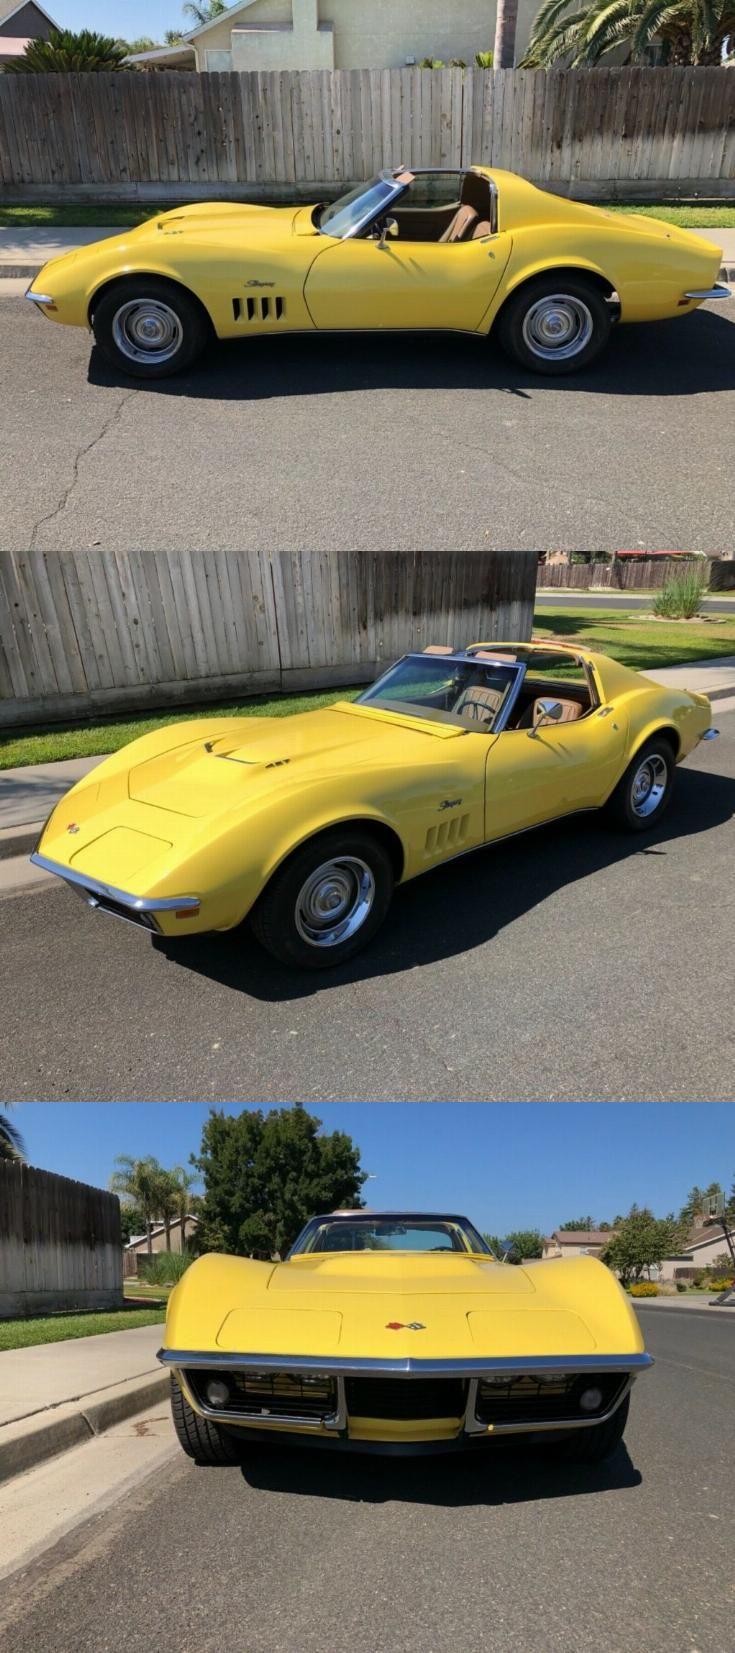 1969 Chevrolet Corvette Stingray in 2020 Chevrolet